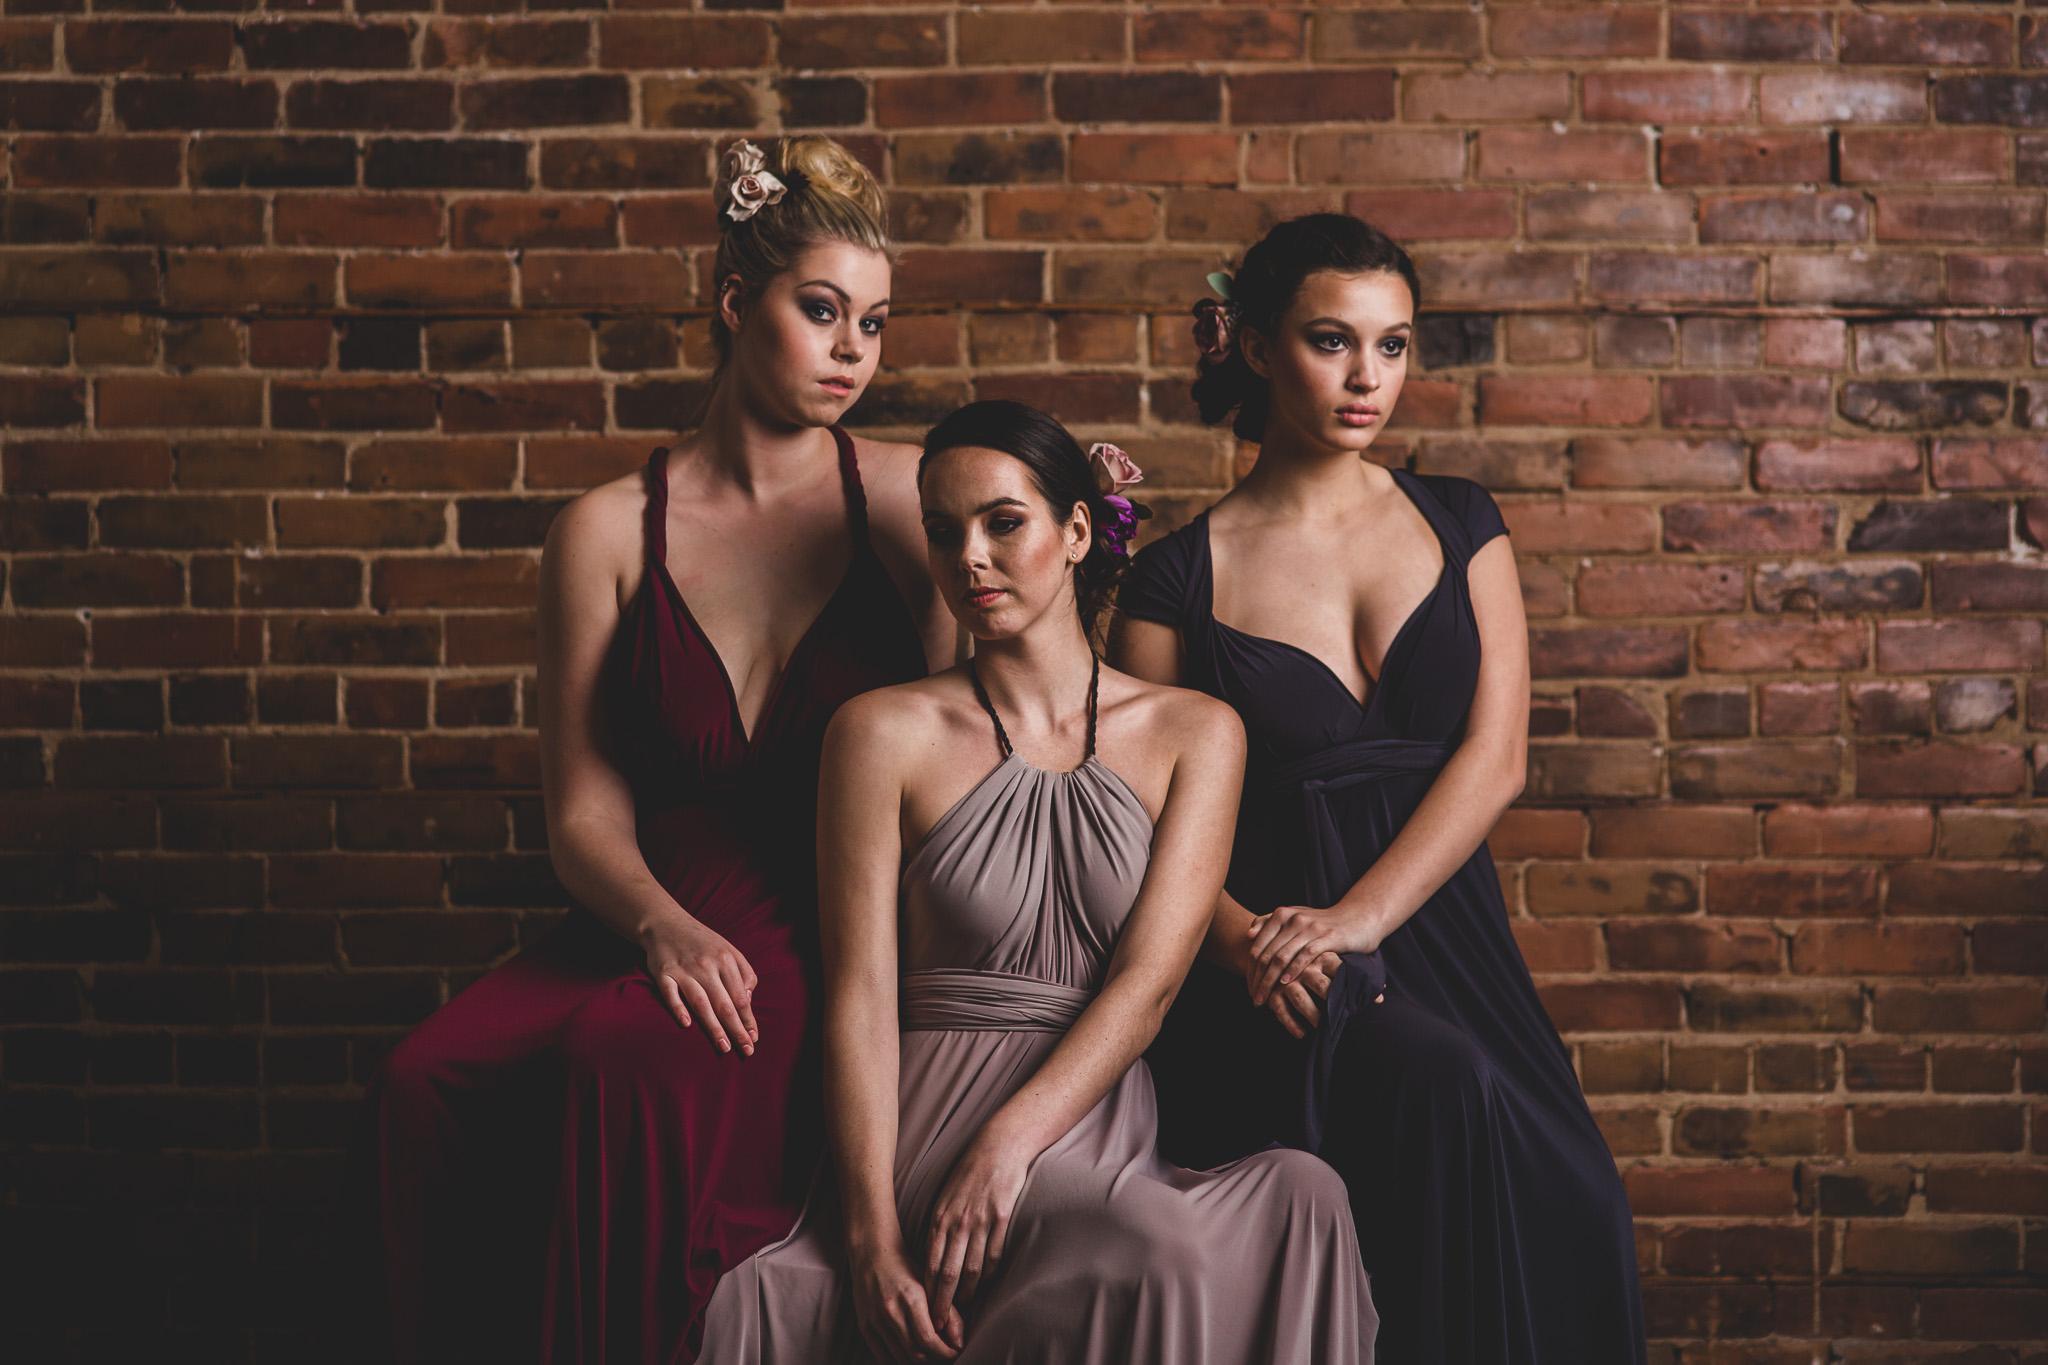 arroh-and-bow-infinity-bridesmaids-dresses-convertible-bridesmaids-dresses-ivory-and-beau-savannah-bridal-boutique-savannah-bridesmaids-dresses-savannah-bridal-shop-savannah-bridesmaids-party.jpg